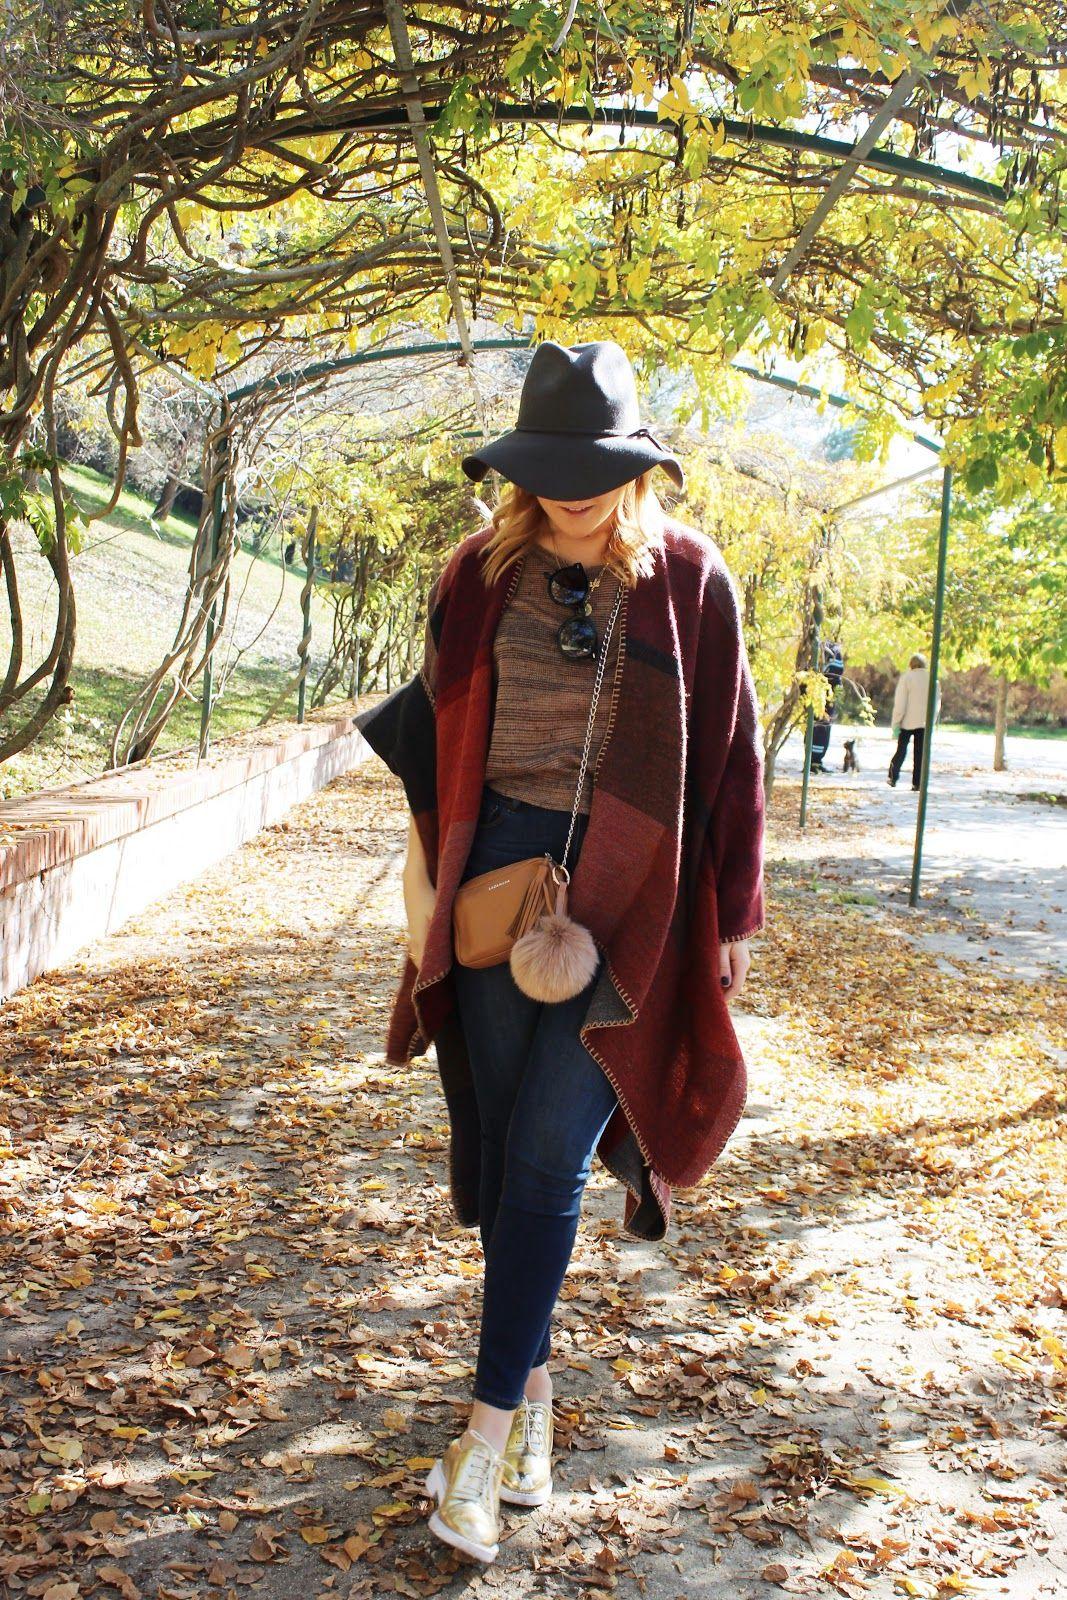 #blogger #girl #style  #fall #2015 #streetstyle #autumn #trends #tendencias #otono #invierno #look #hat #poncho